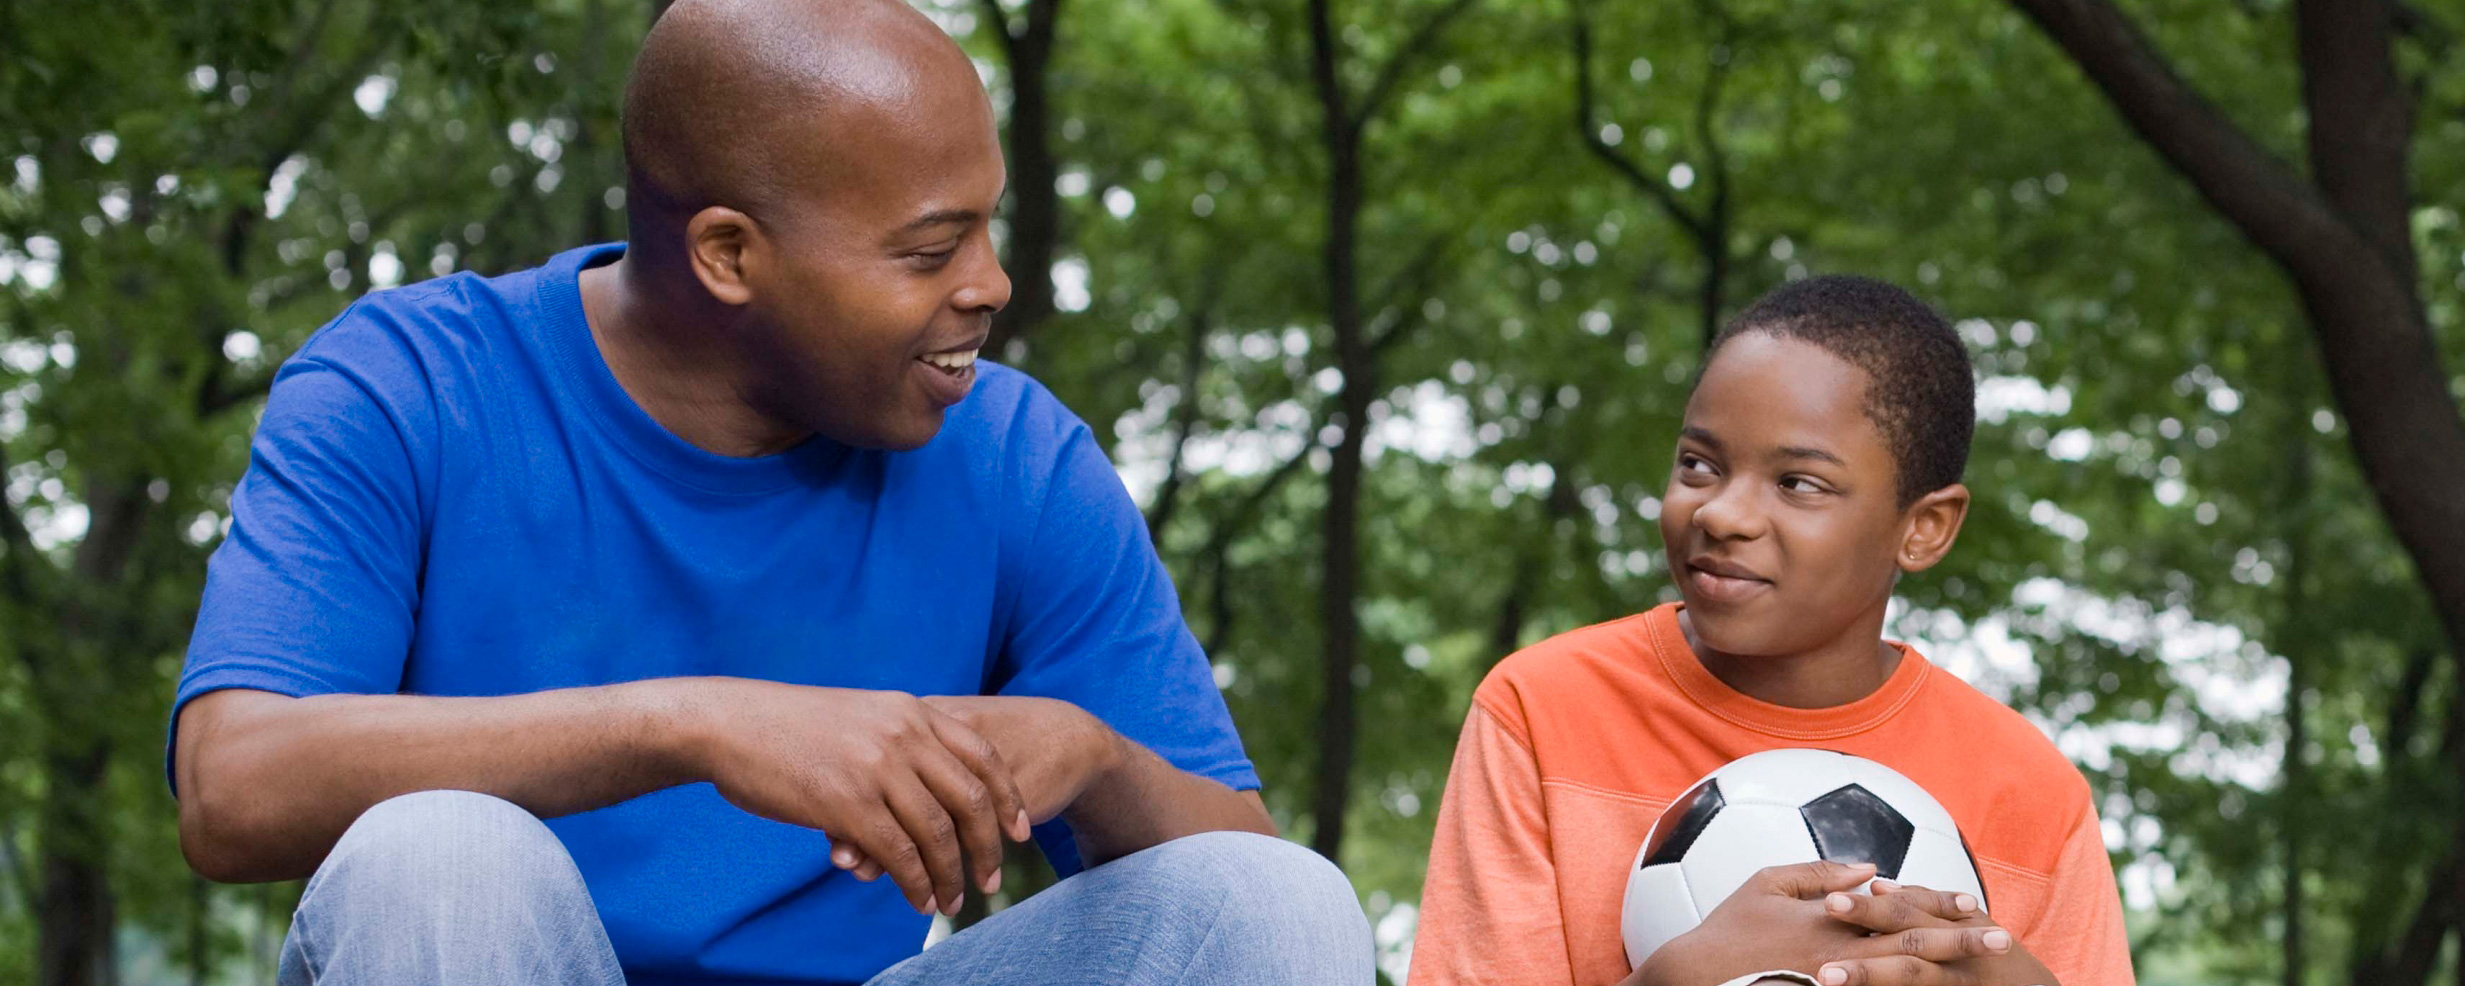 New York State Youth Mentoring Program